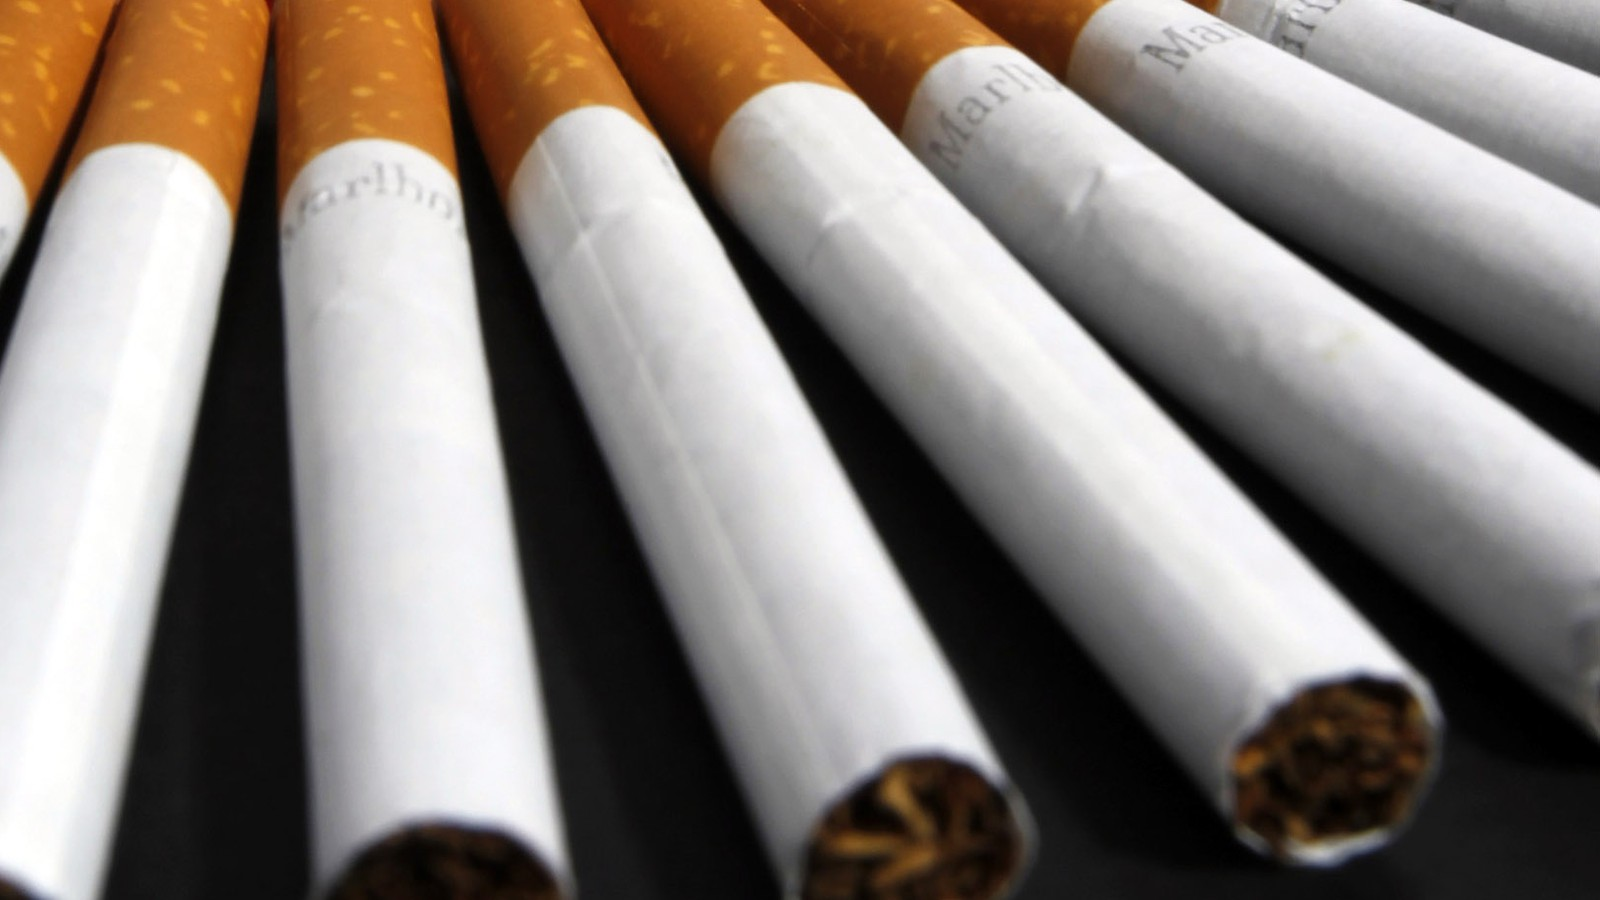 How Tobacco Companies Contest The Scientific Consensus On Low Tar Cigarettes The Atlantic